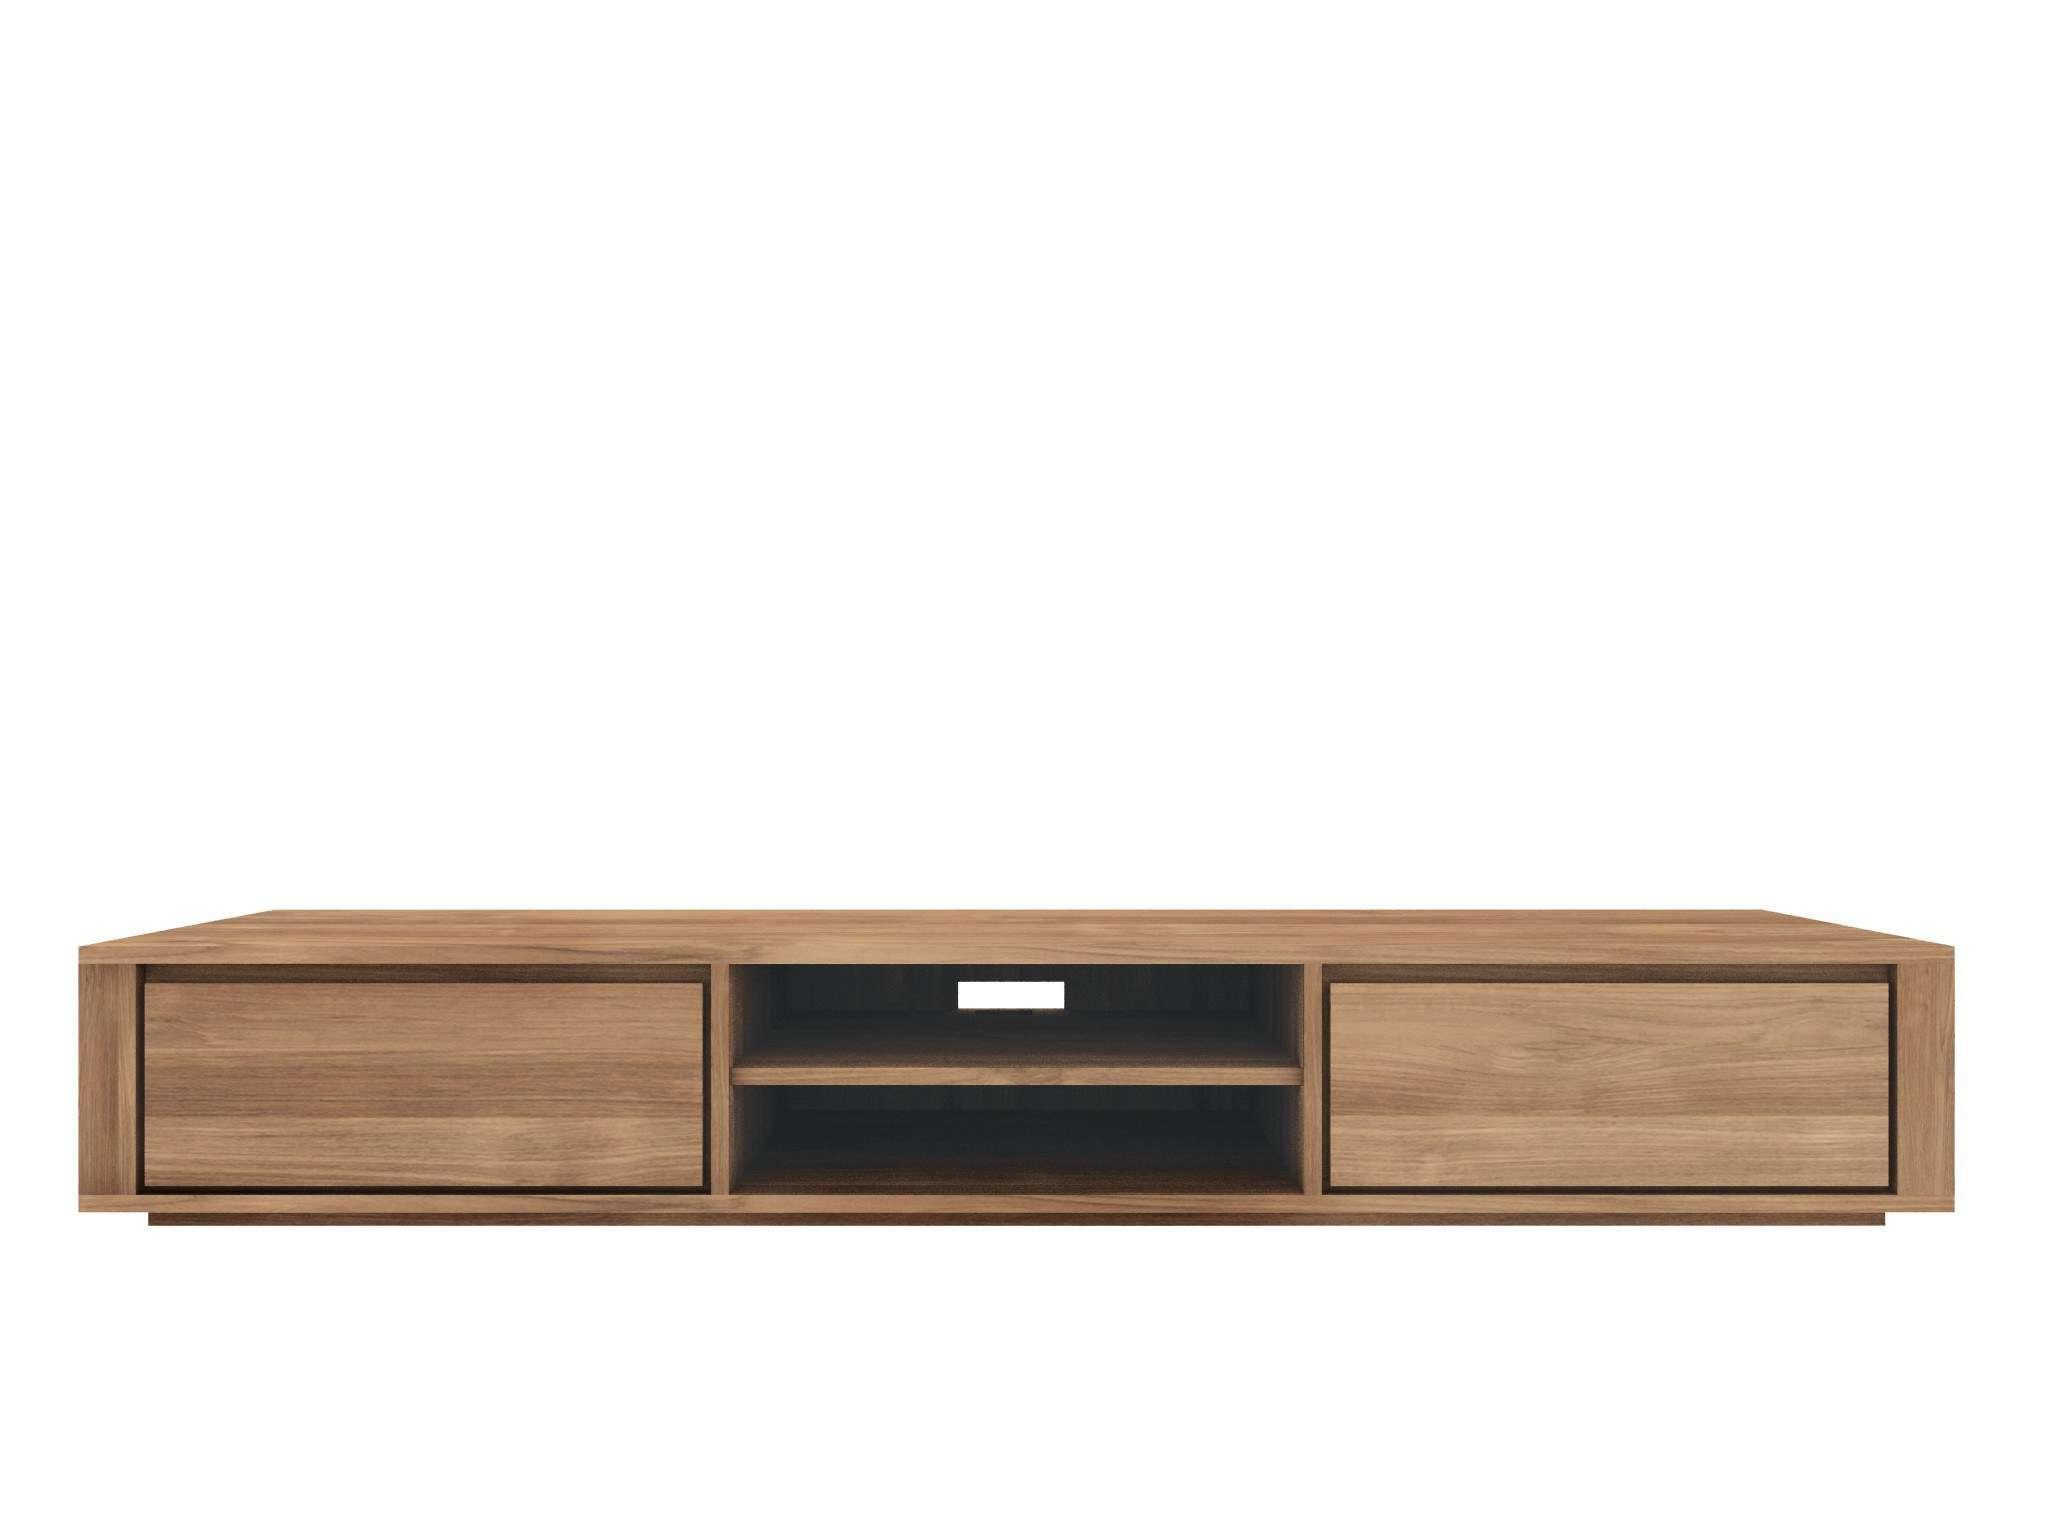 Absorbing Home Design Long Tv Stands Along With Long Tv Stands For Low Long Tv Stands (View 9 of 15)